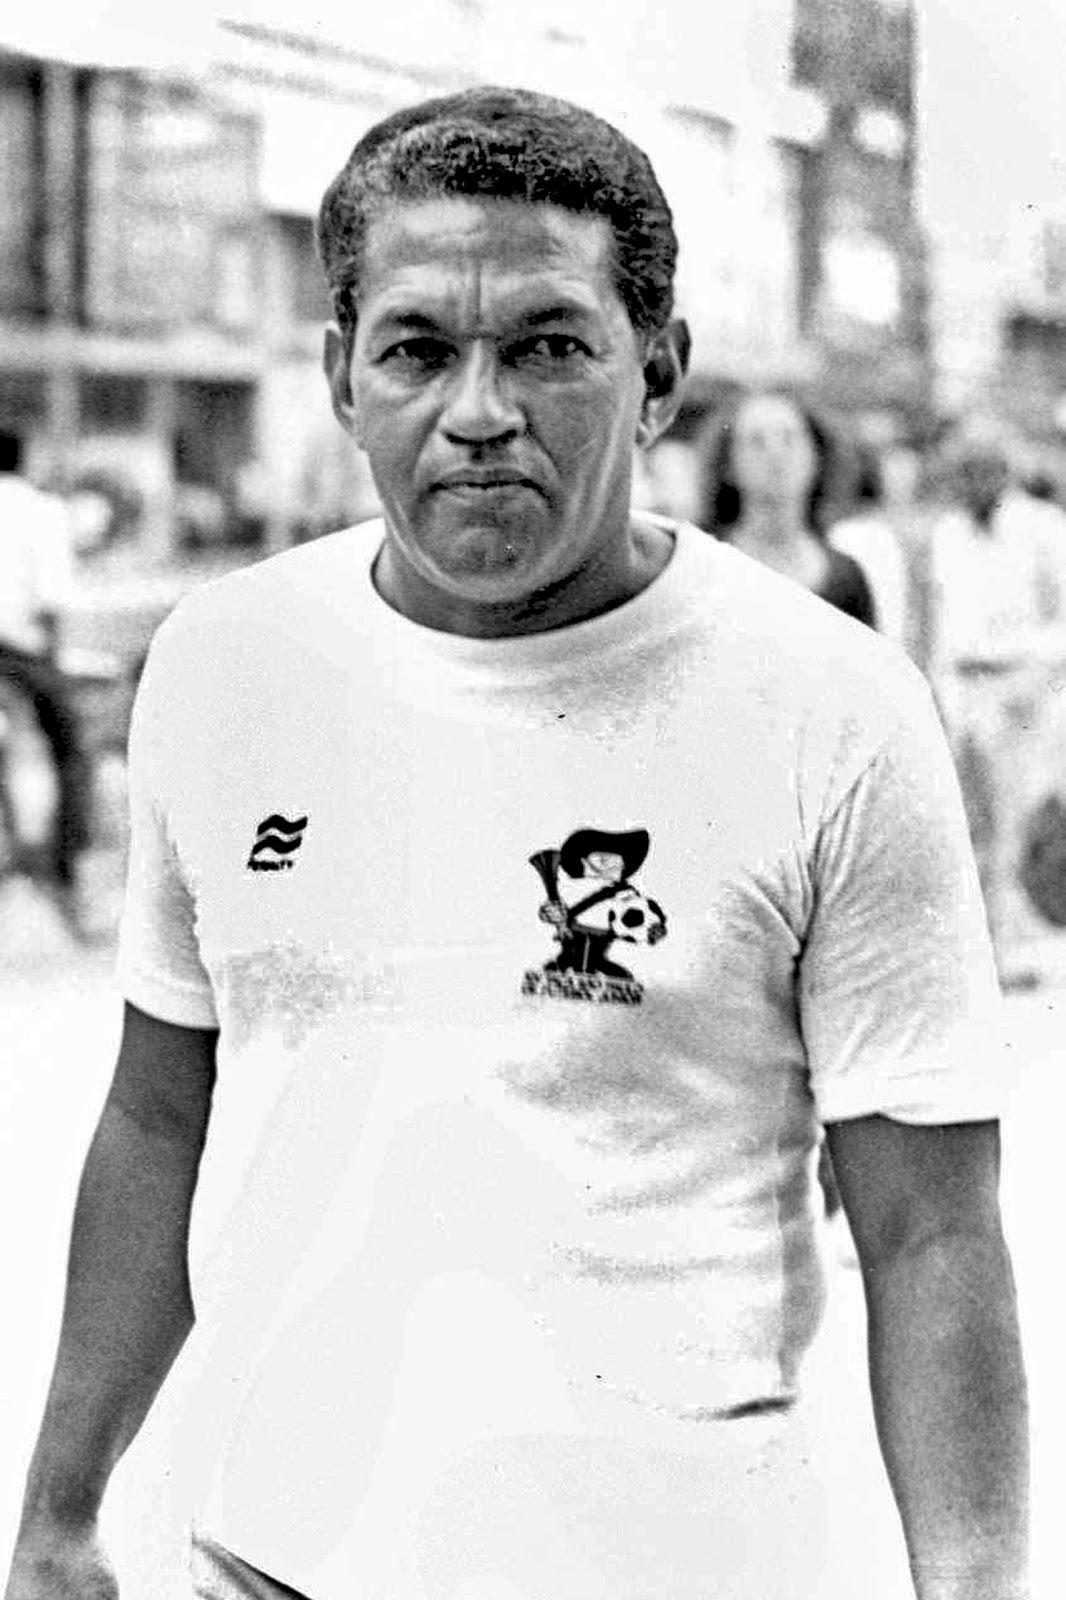 Garrincha in a Wales kit 1966